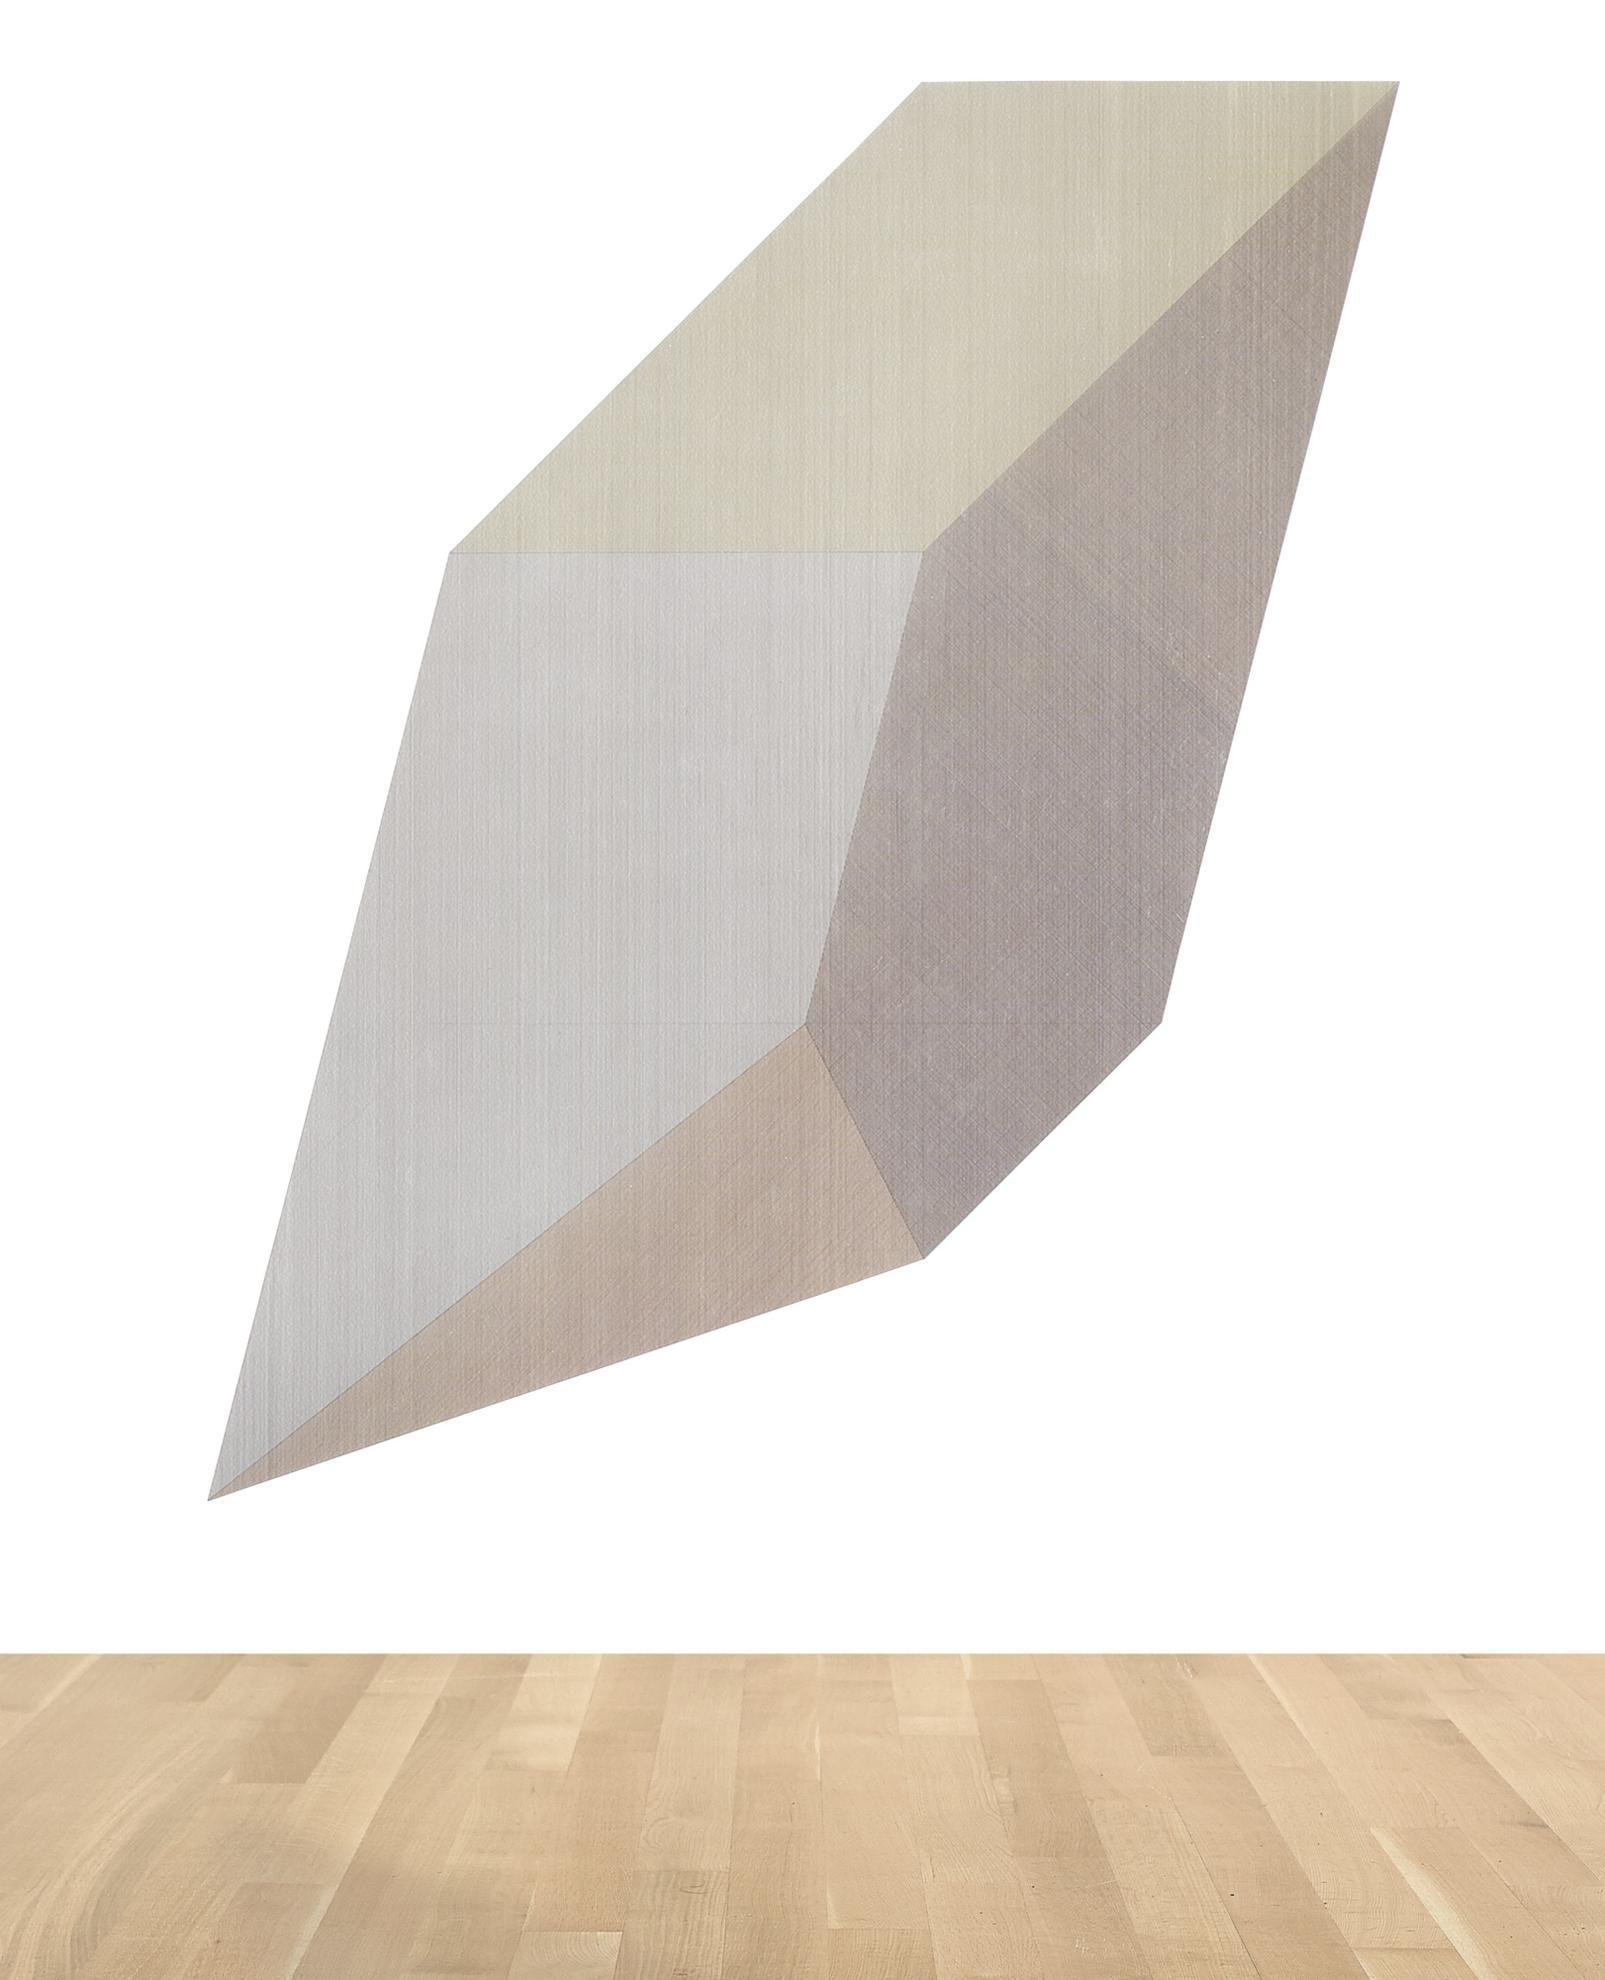 Sol LeWitt-Wall Drawing #533-1987